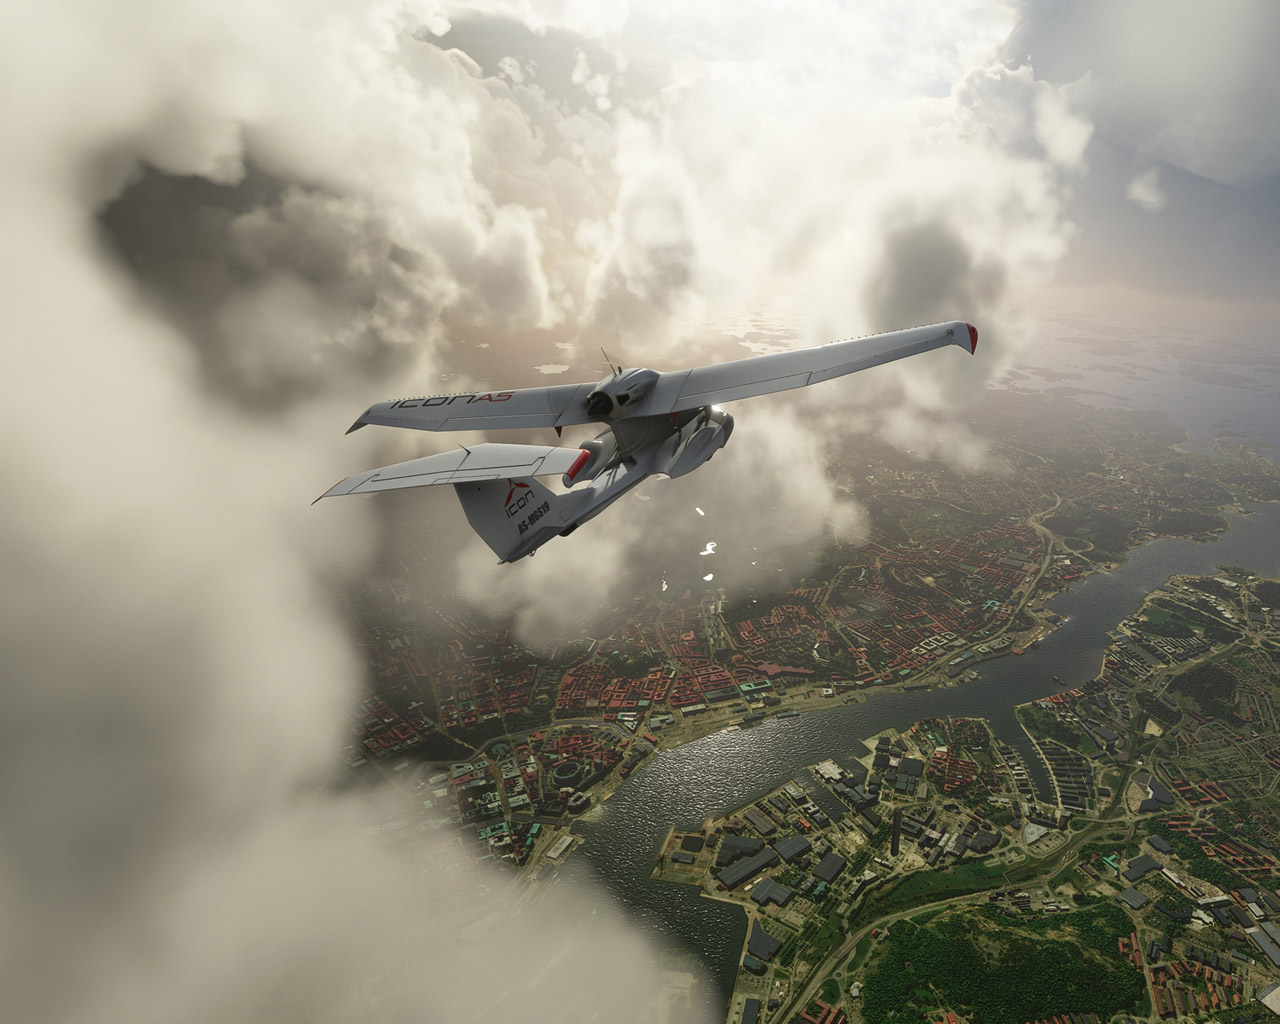 Free Microsoft Flight Simulator (2020) Wallpaper in 1280x1024